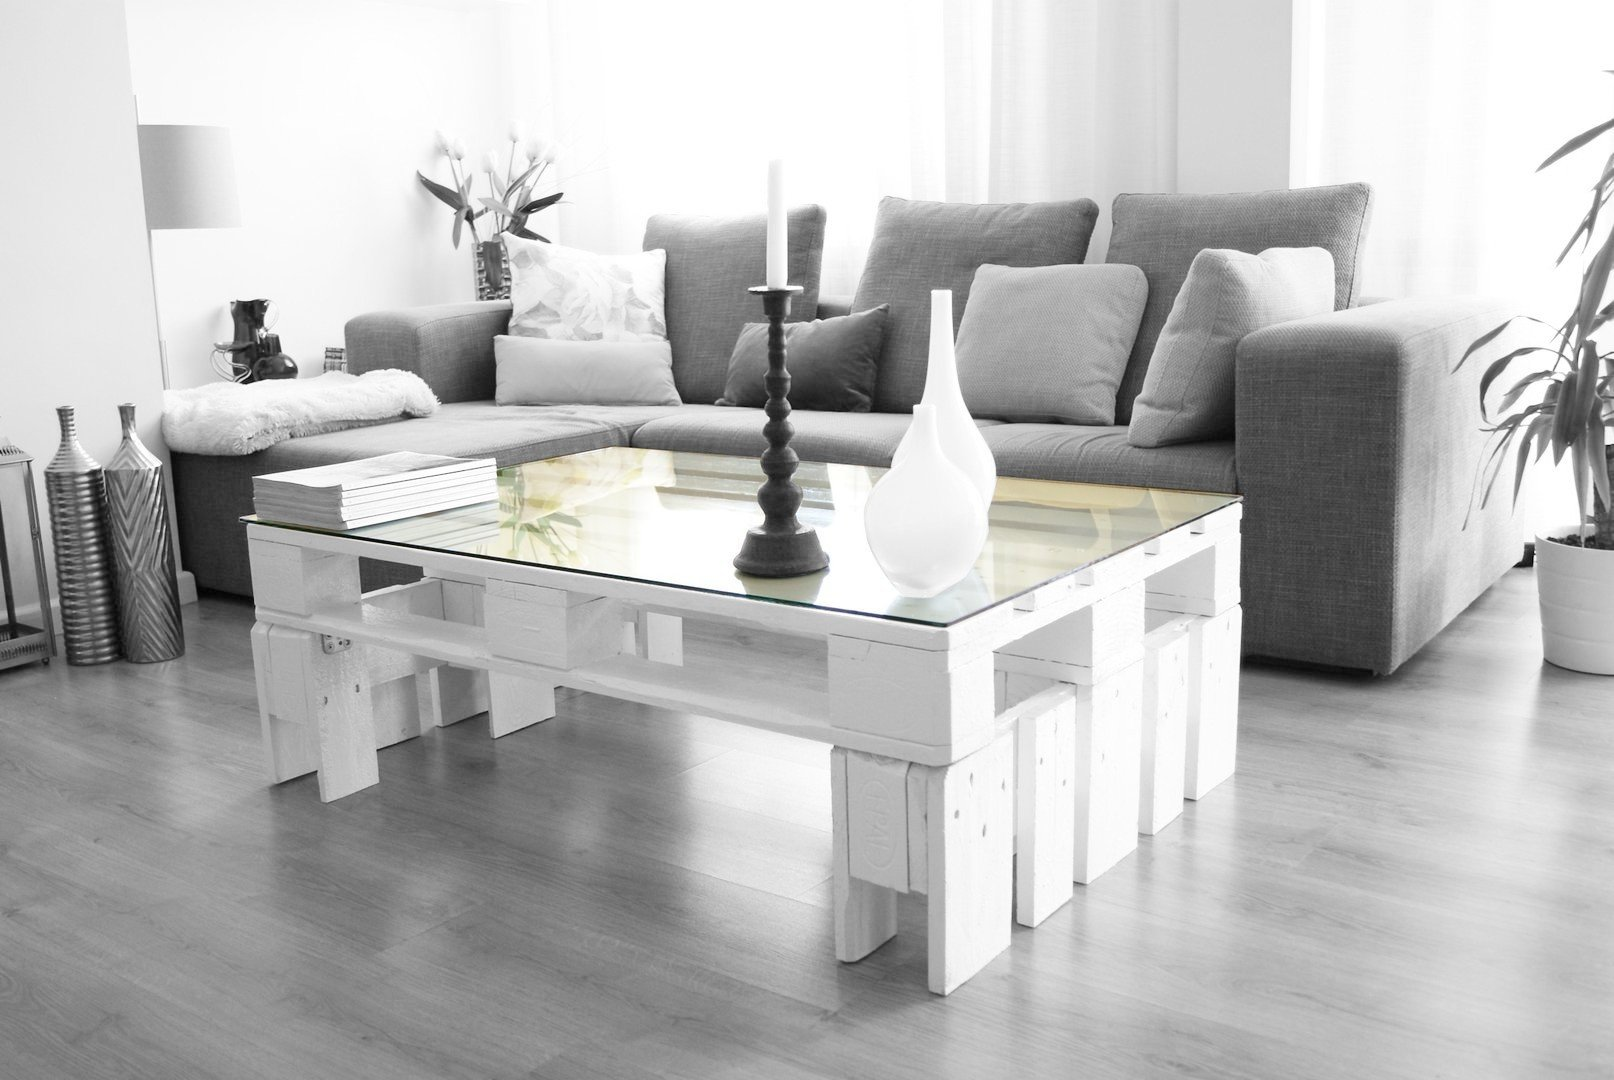 Cristal vidrio templado para mesa palet 120 x 80 cm for Mesa cristal 4 personas